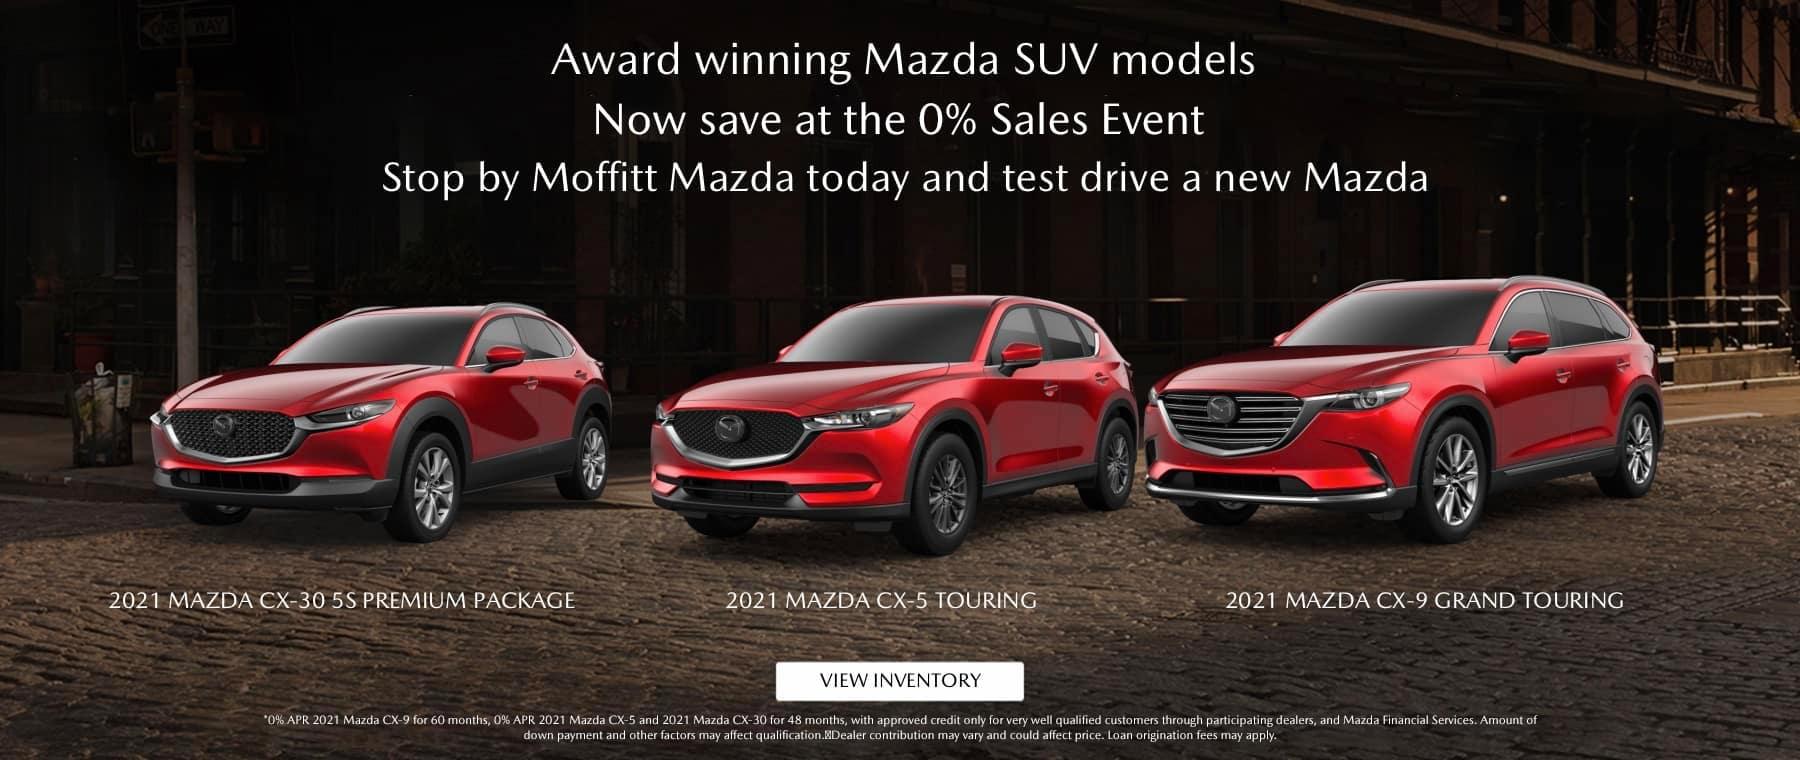 2021 Mazda SUV